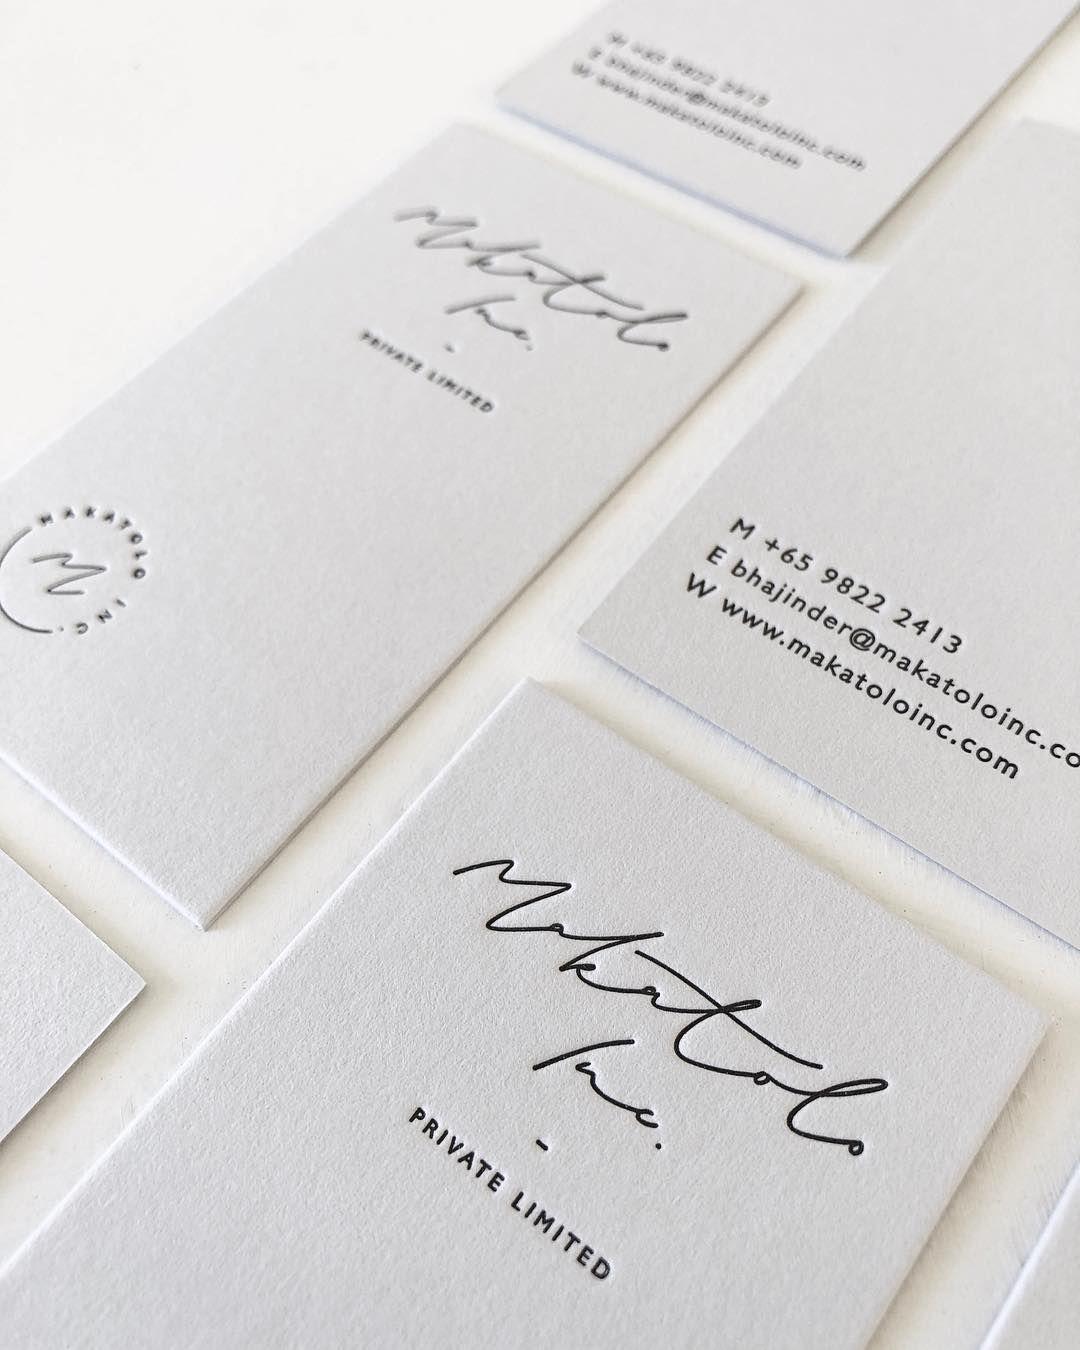 Branding For Makatolo Inc In Singapore Hand Lettered Script Black Letterpress Into 60 Printing Business Cards Jewelry Business Card Letterpress Business Cards